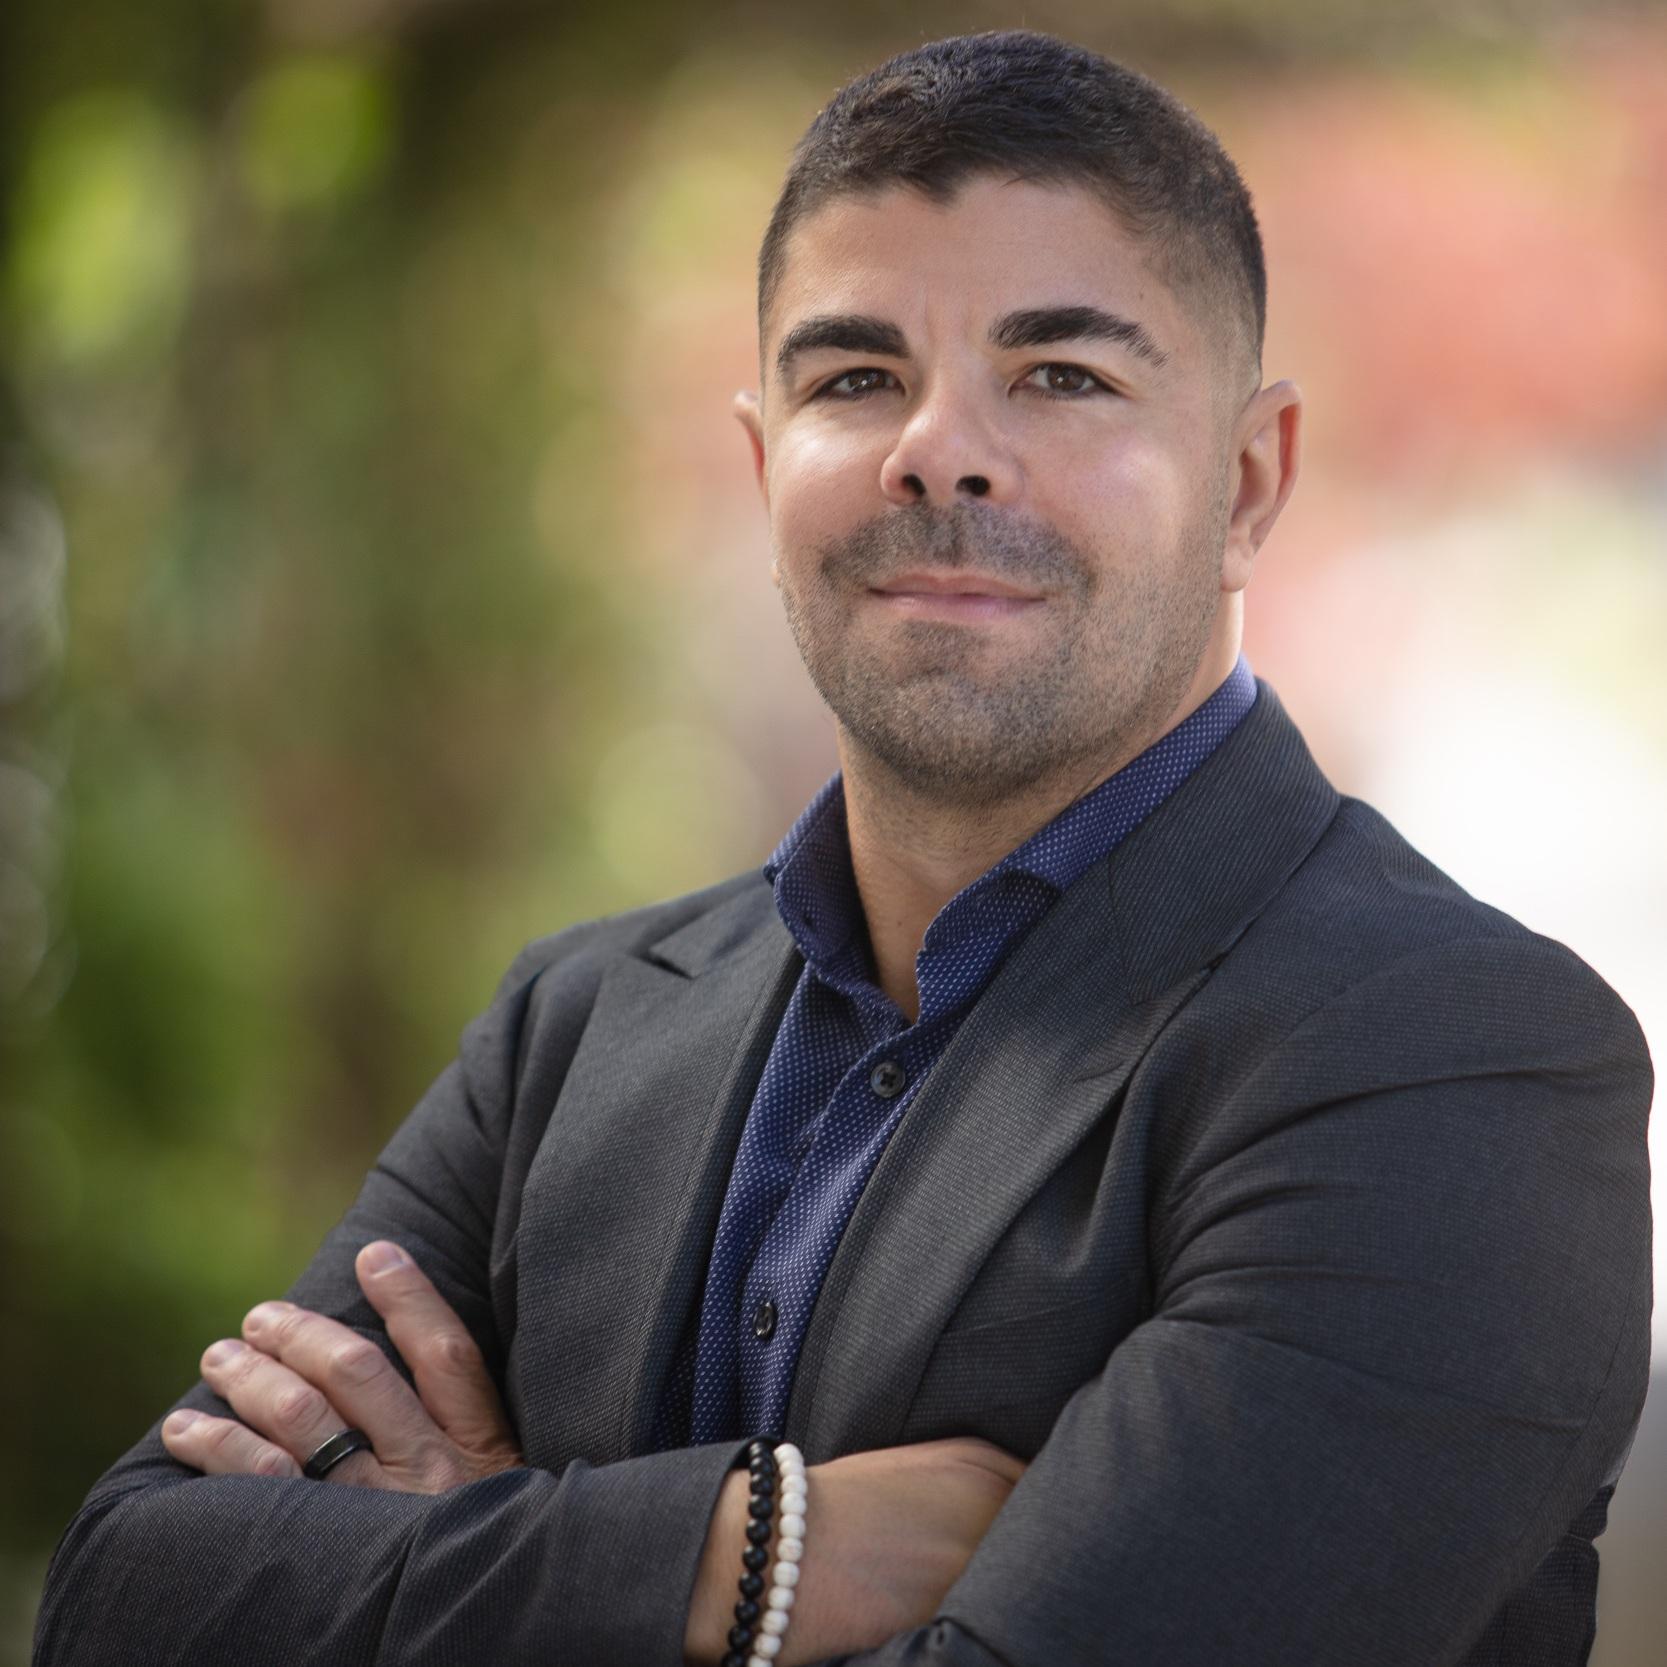 John Souza, Kingsland University (Blockchain Academy)